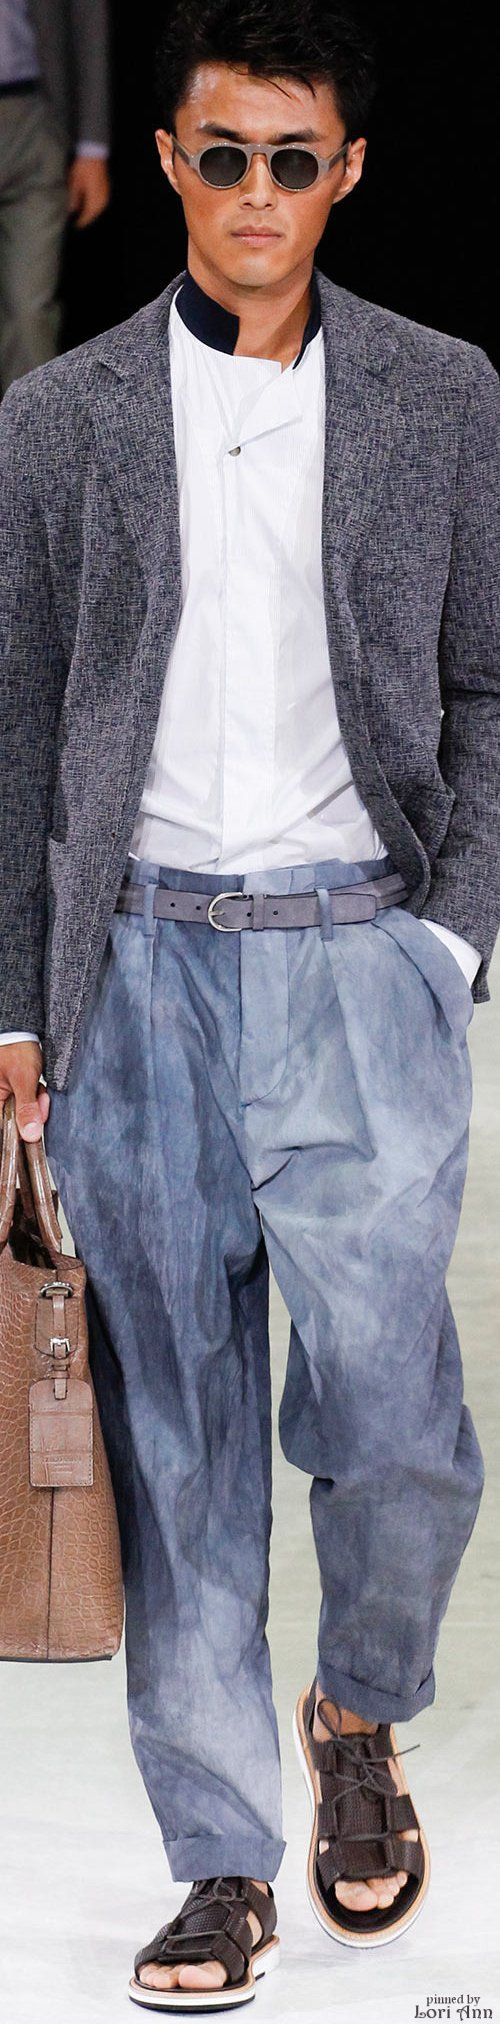 Giorgio Armani 2015 | Men's Fashion | Menswear | Men's Outfit for Spring/Summer | Moda Masculina | Shop at designerclothingfans.com